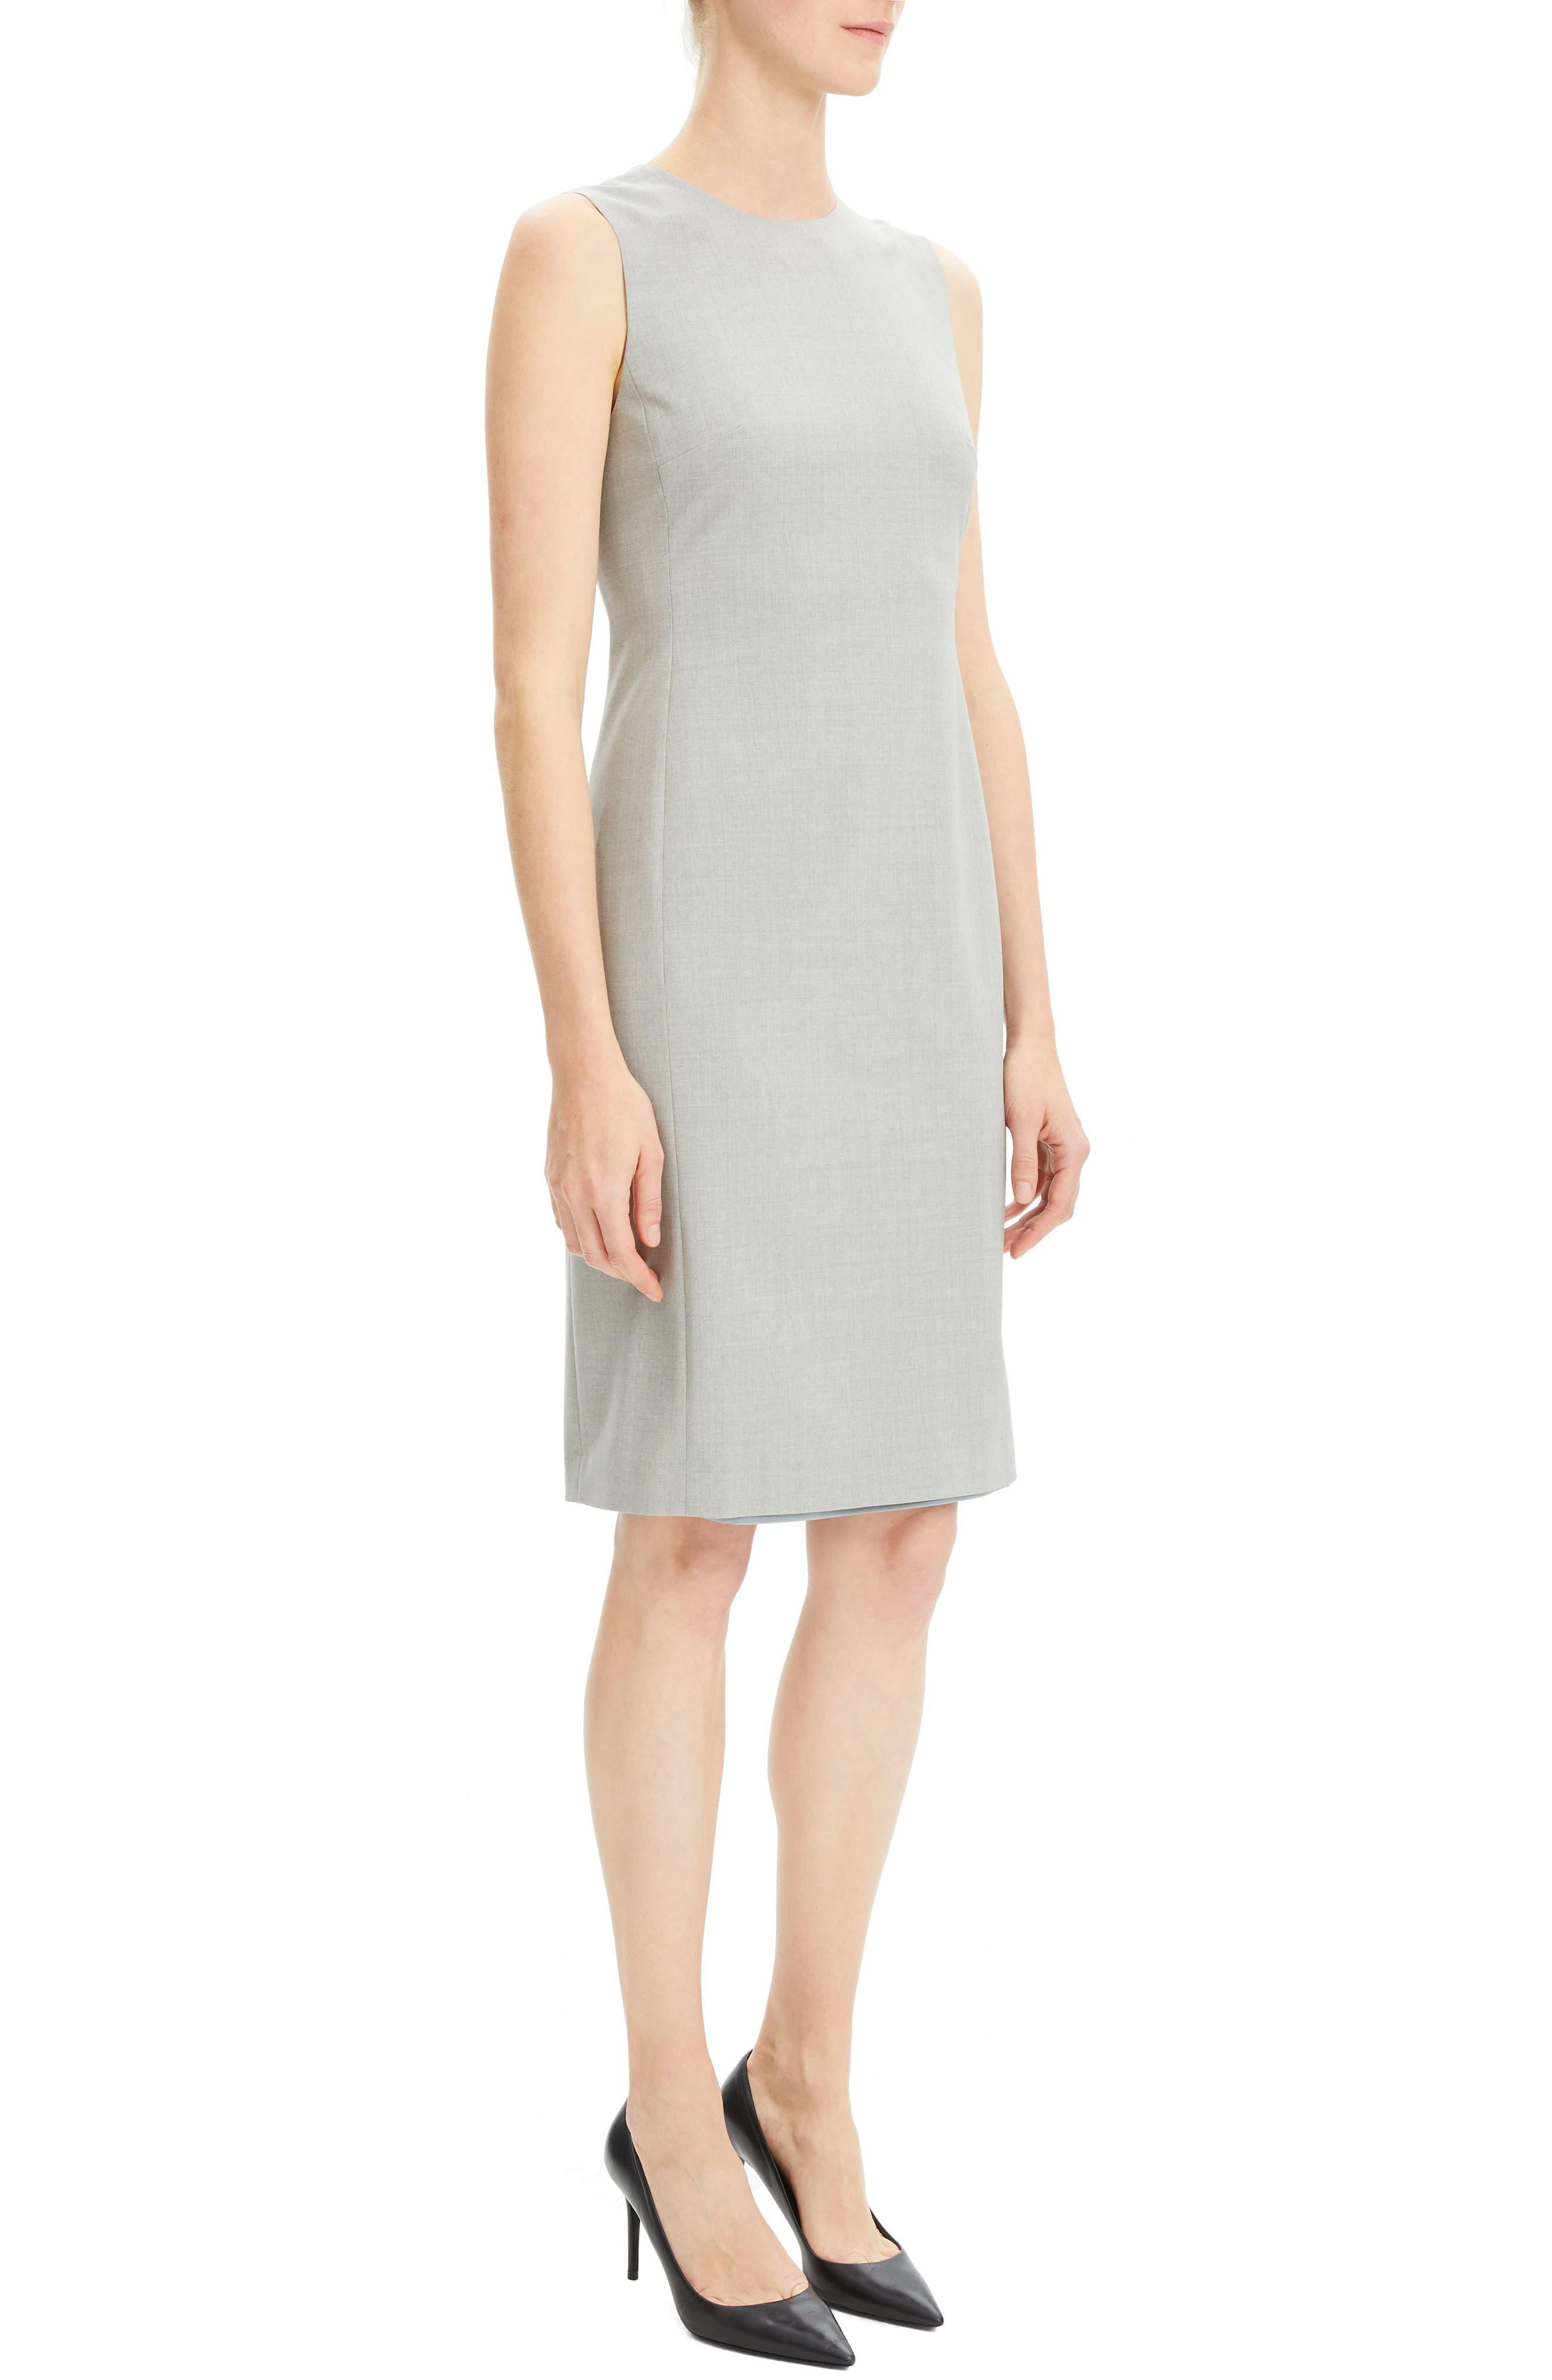 THEORY,                             Eano Good Wool Sheath Dress,                             Alternate thumbnail 3, color,                             050